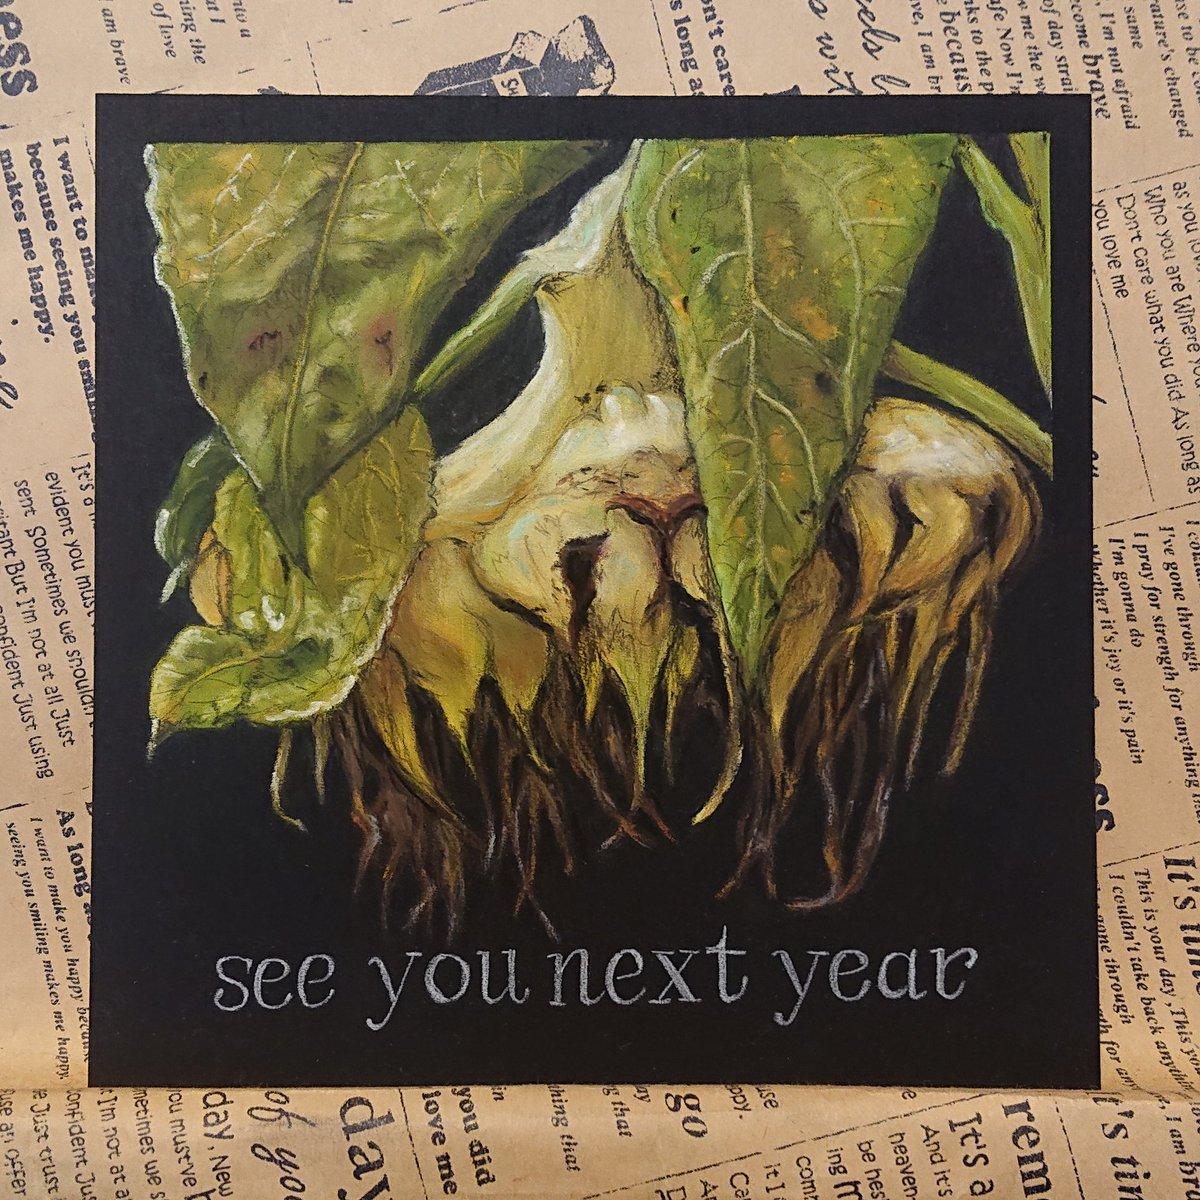 『see you next year』🎵枯れたヒマワリ🌻を描いてみました🎵#チョークアート #オイルパステル